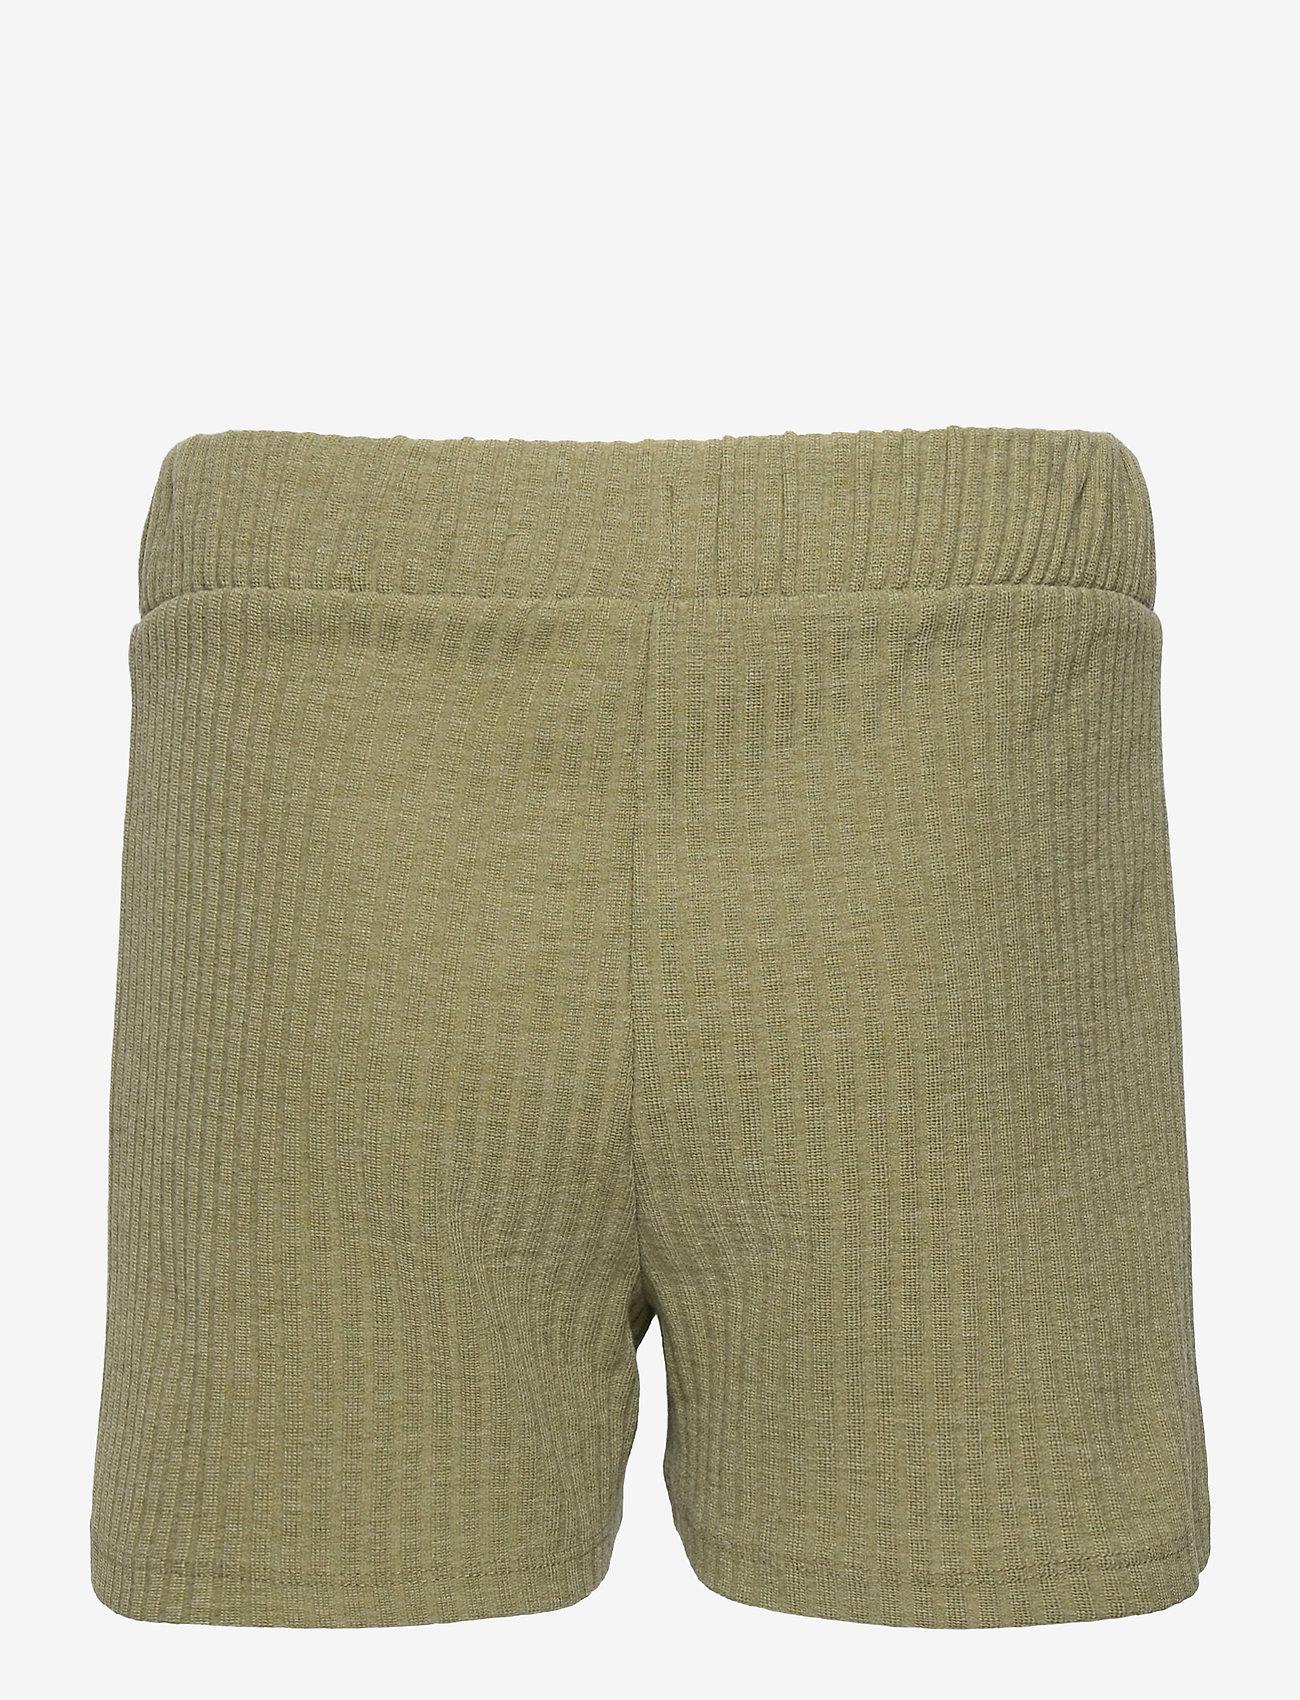 Kids Only - KONNELLA SHORTS JRS - shorts - sage - 1